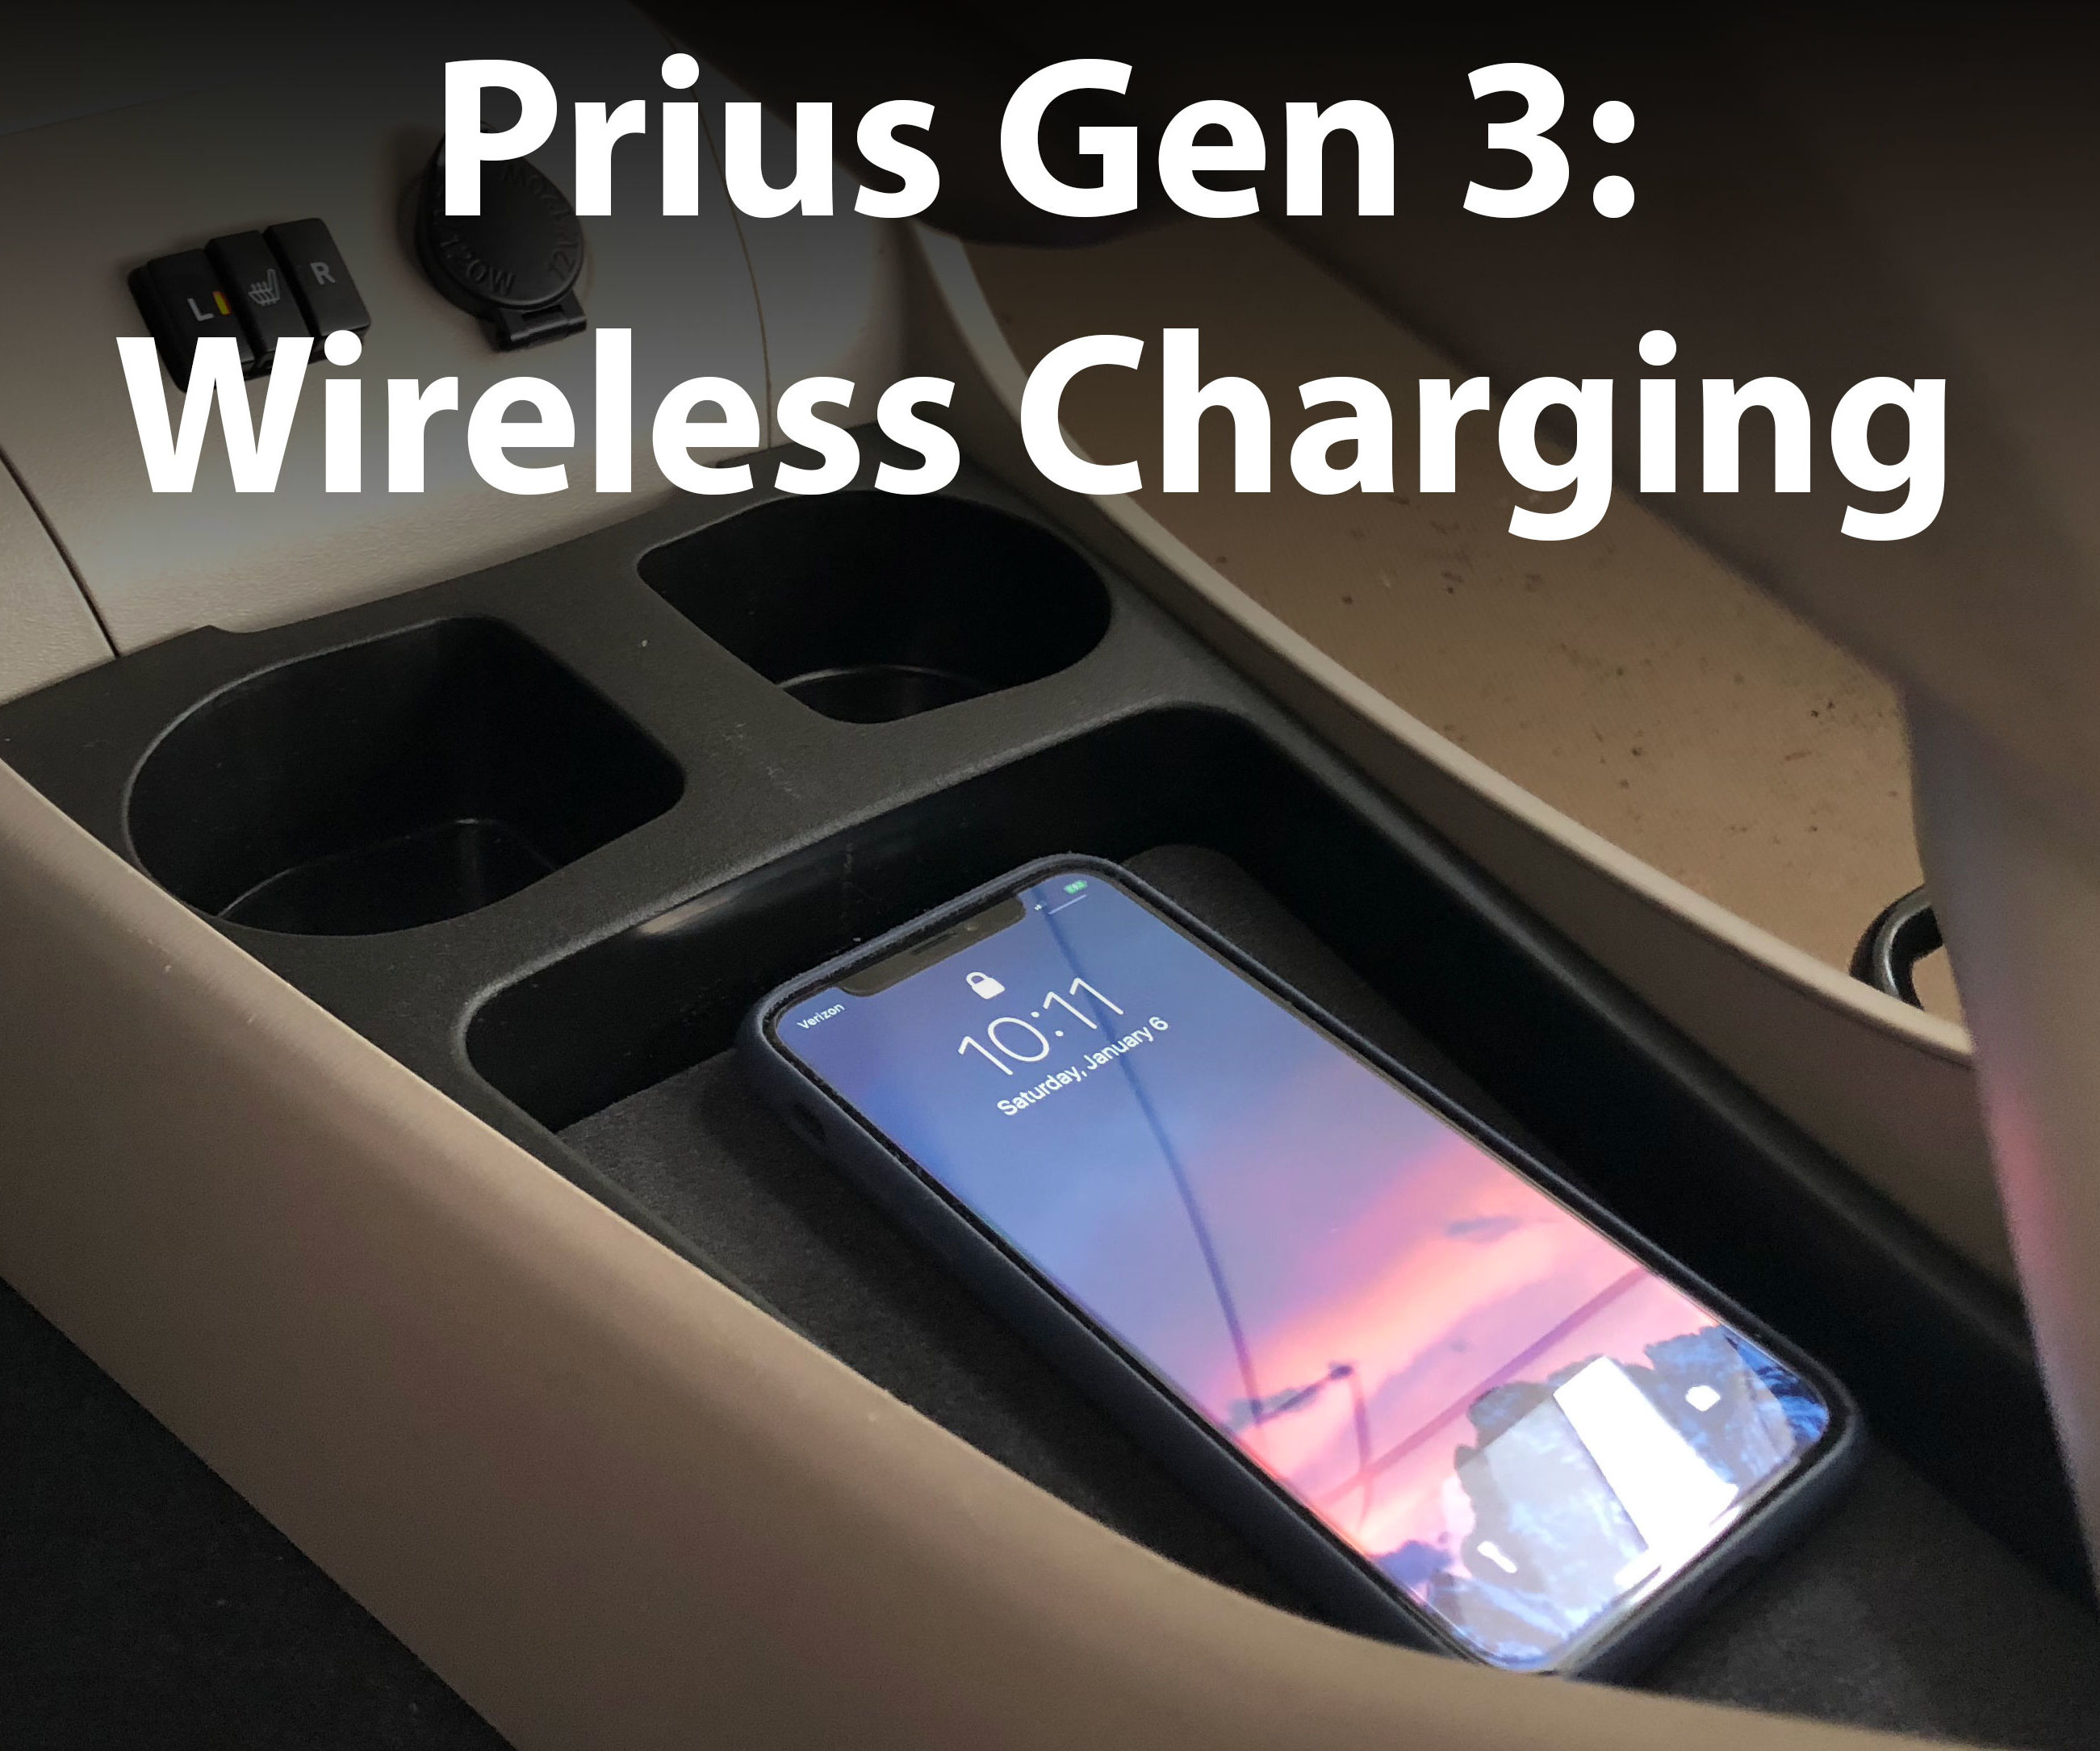 2006 Prius Headlight Wiring Diagram Electrical Diagrams Toyota Schematic Gen 3 Product U2022 Mustang